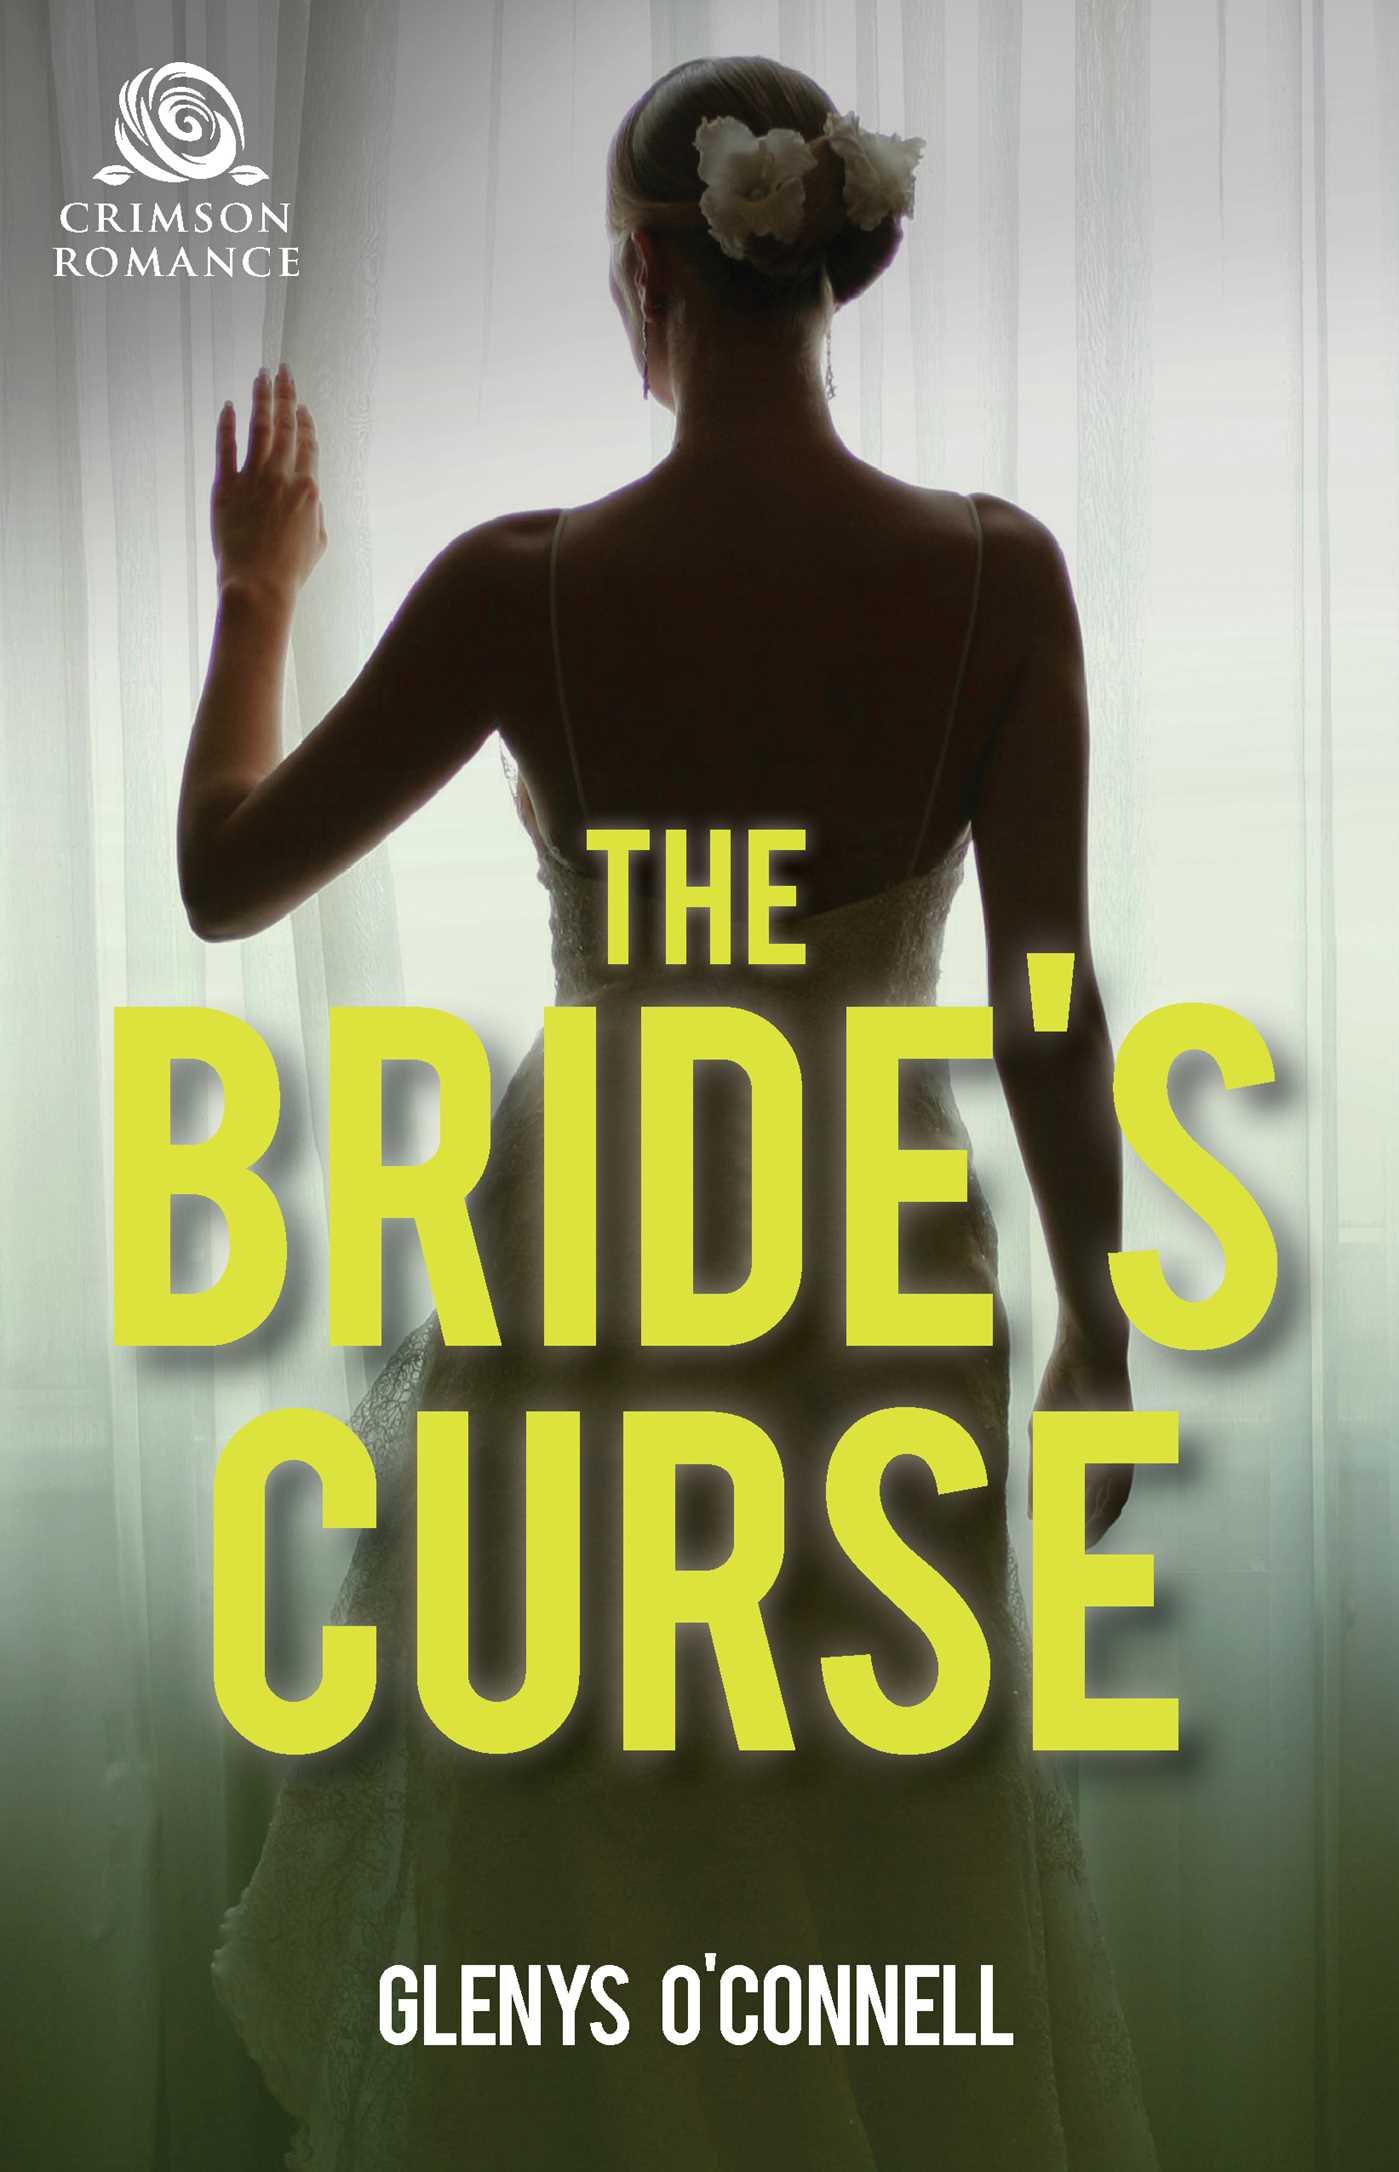 The brides curse 9781440593444 hr